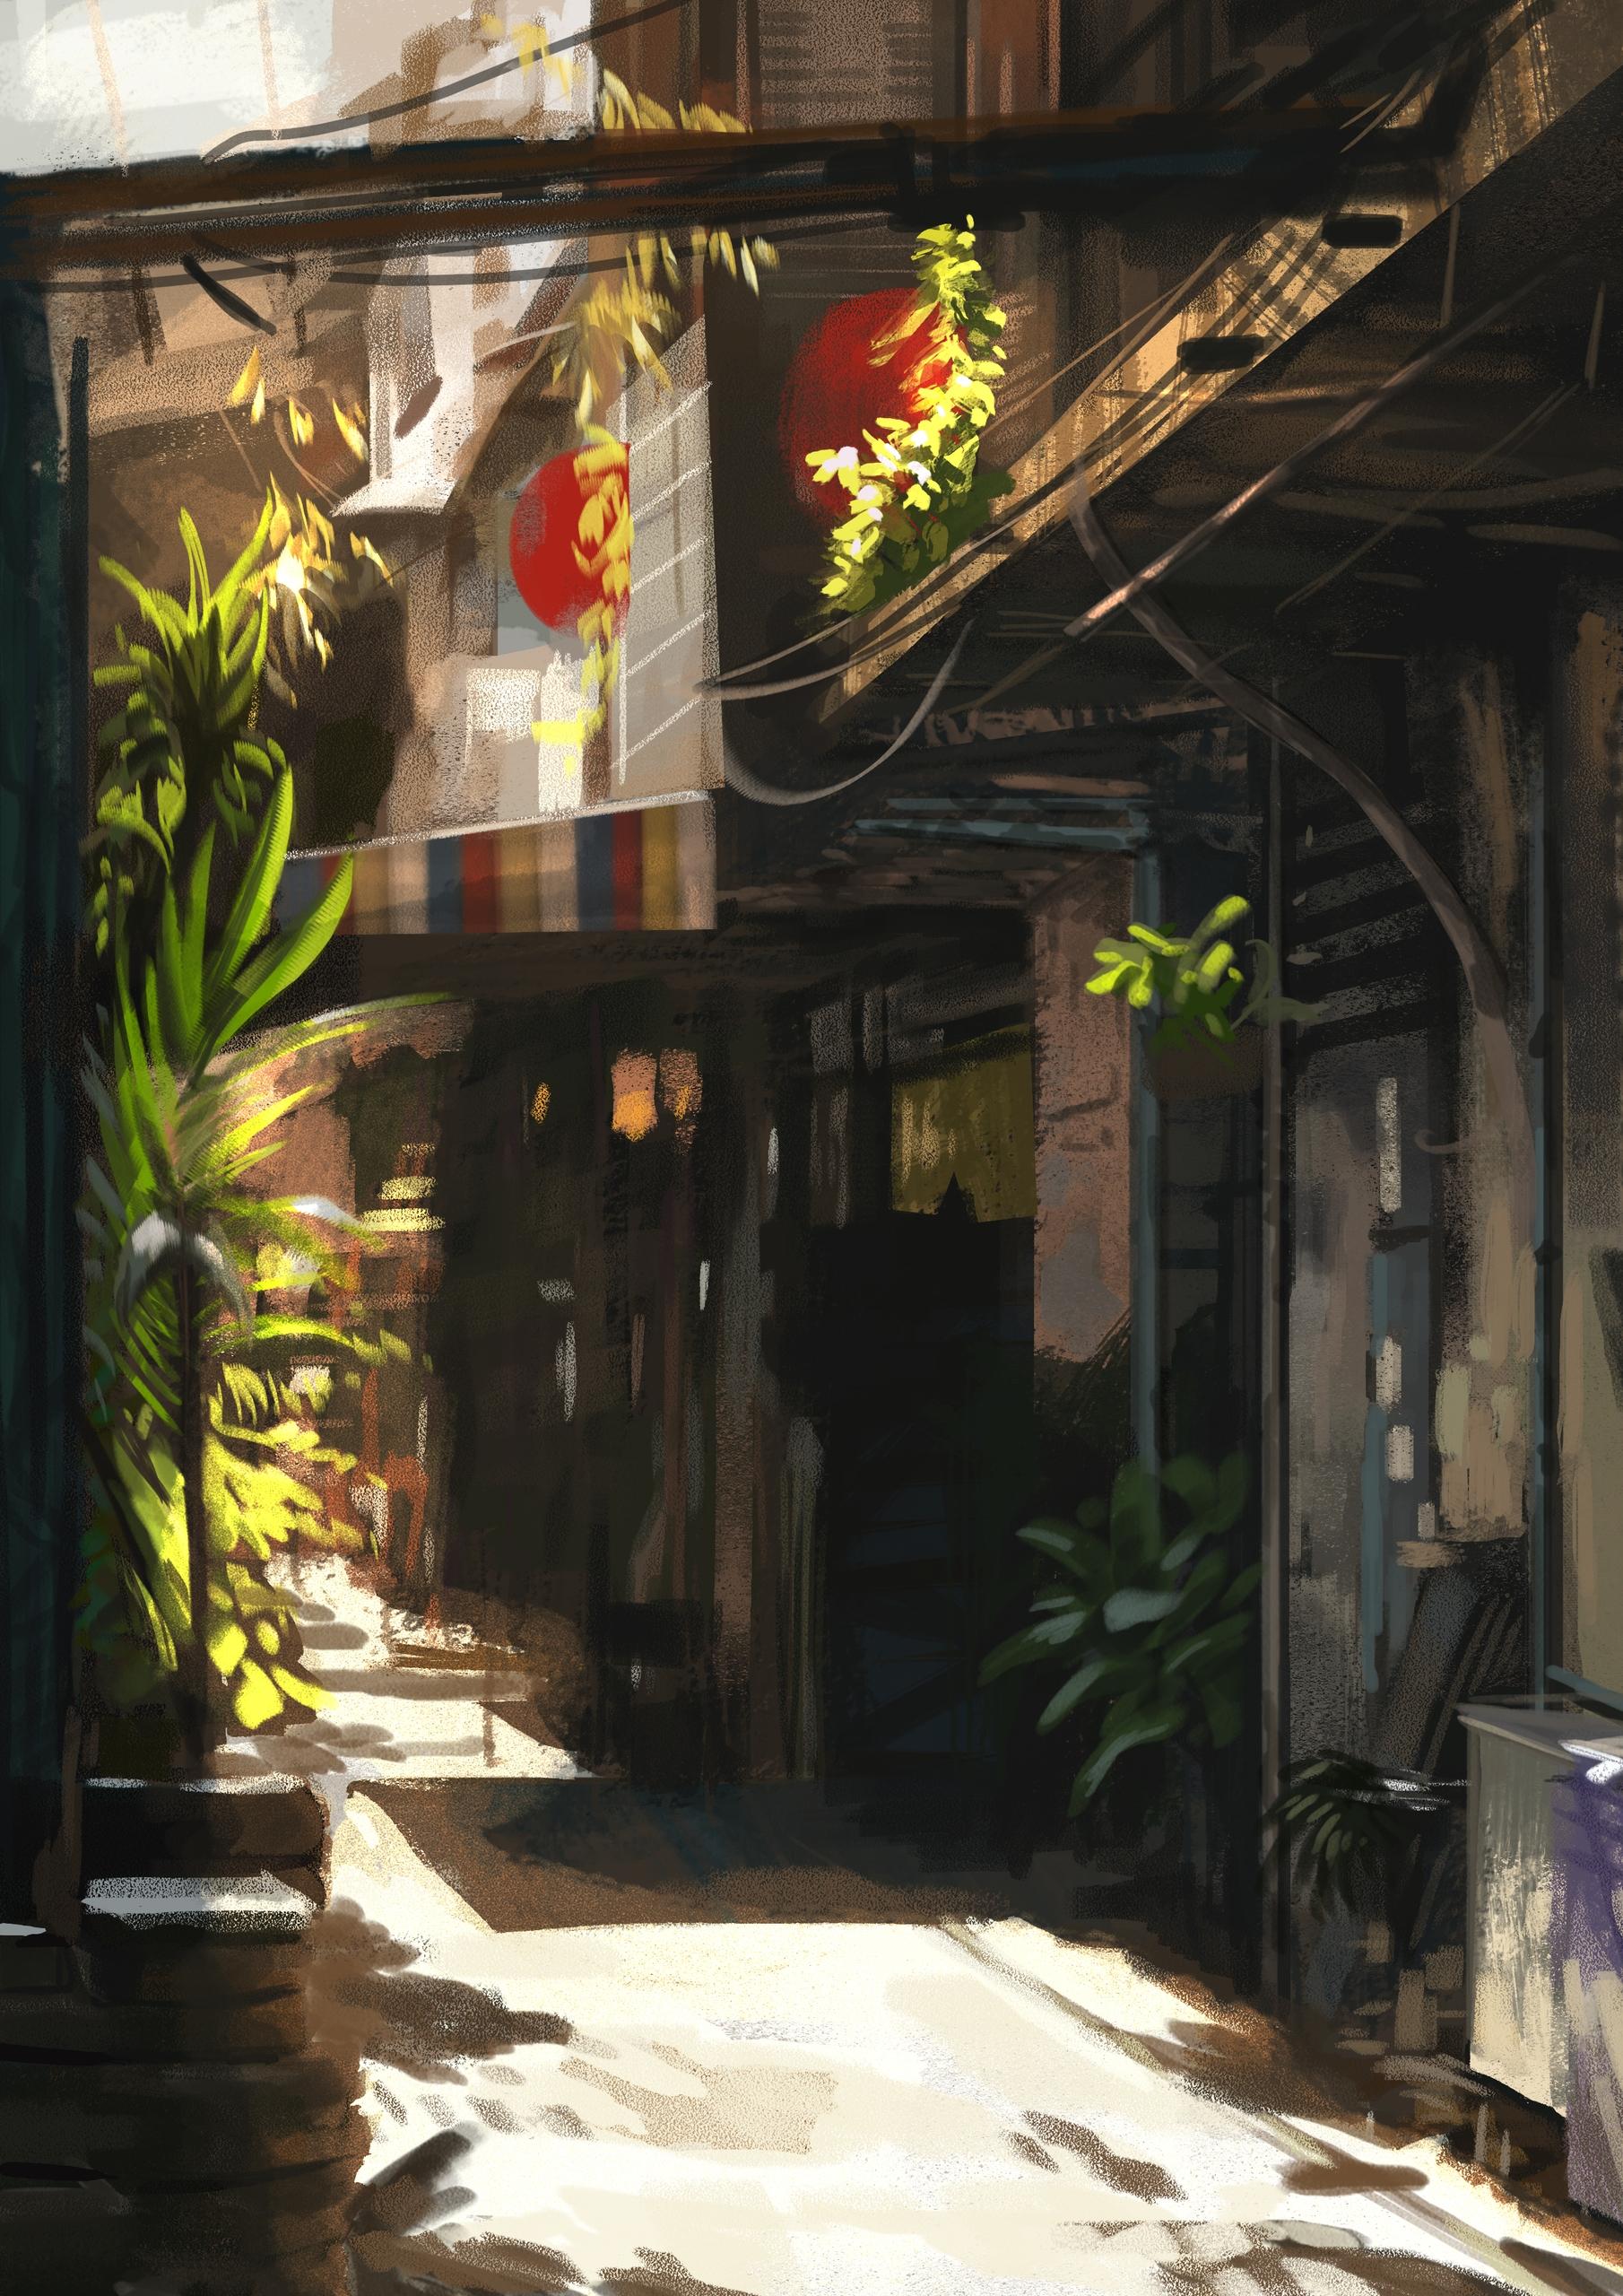 alley (study - street, enviroment - stephanieboehm | ello